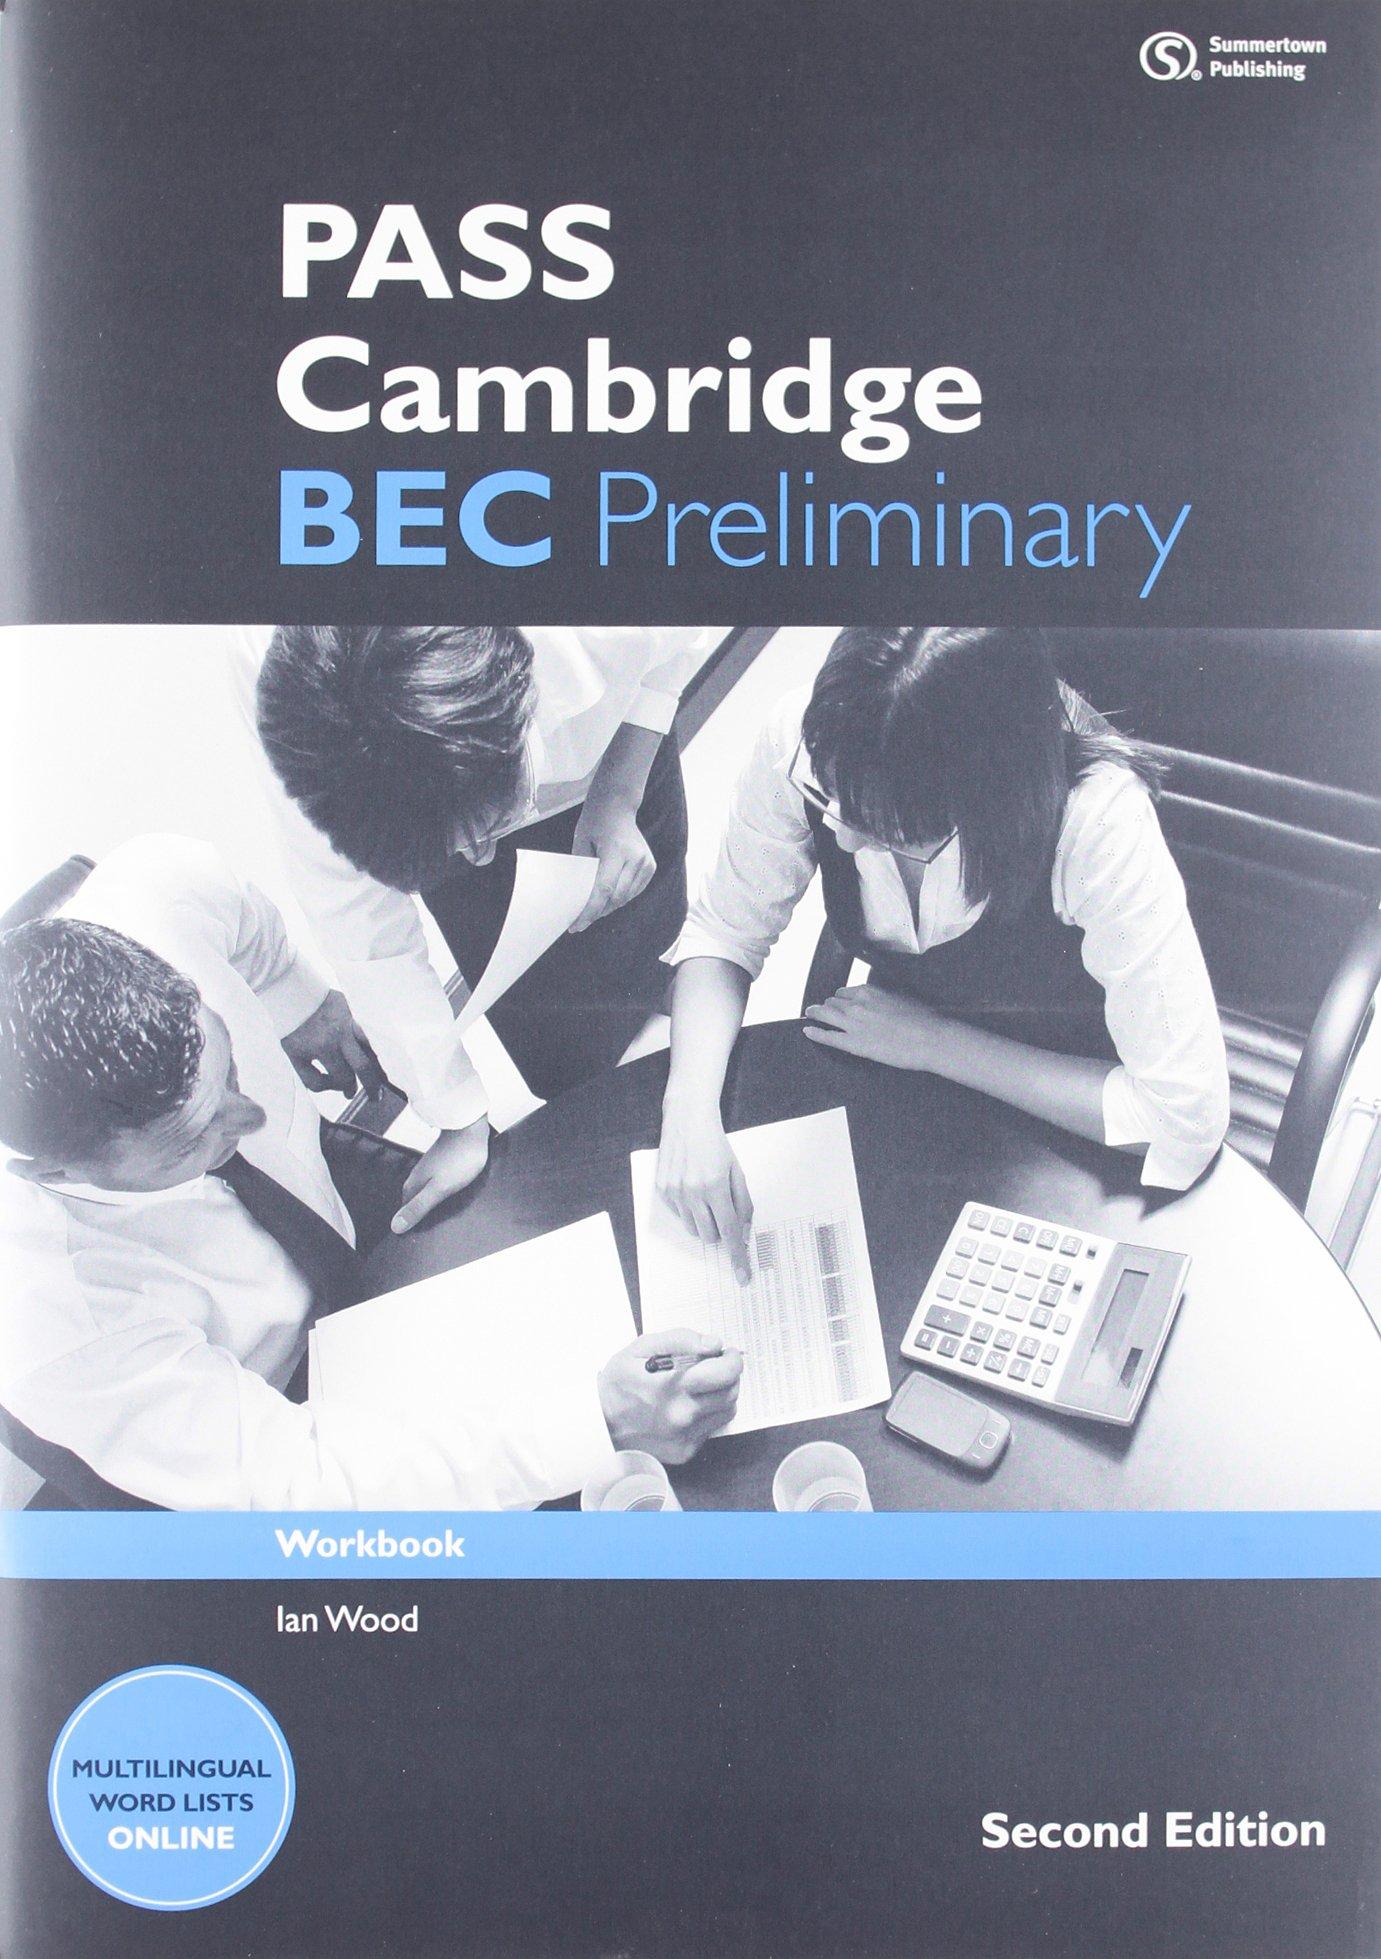 PASS Cambridge BEC Preliminary: Workbook